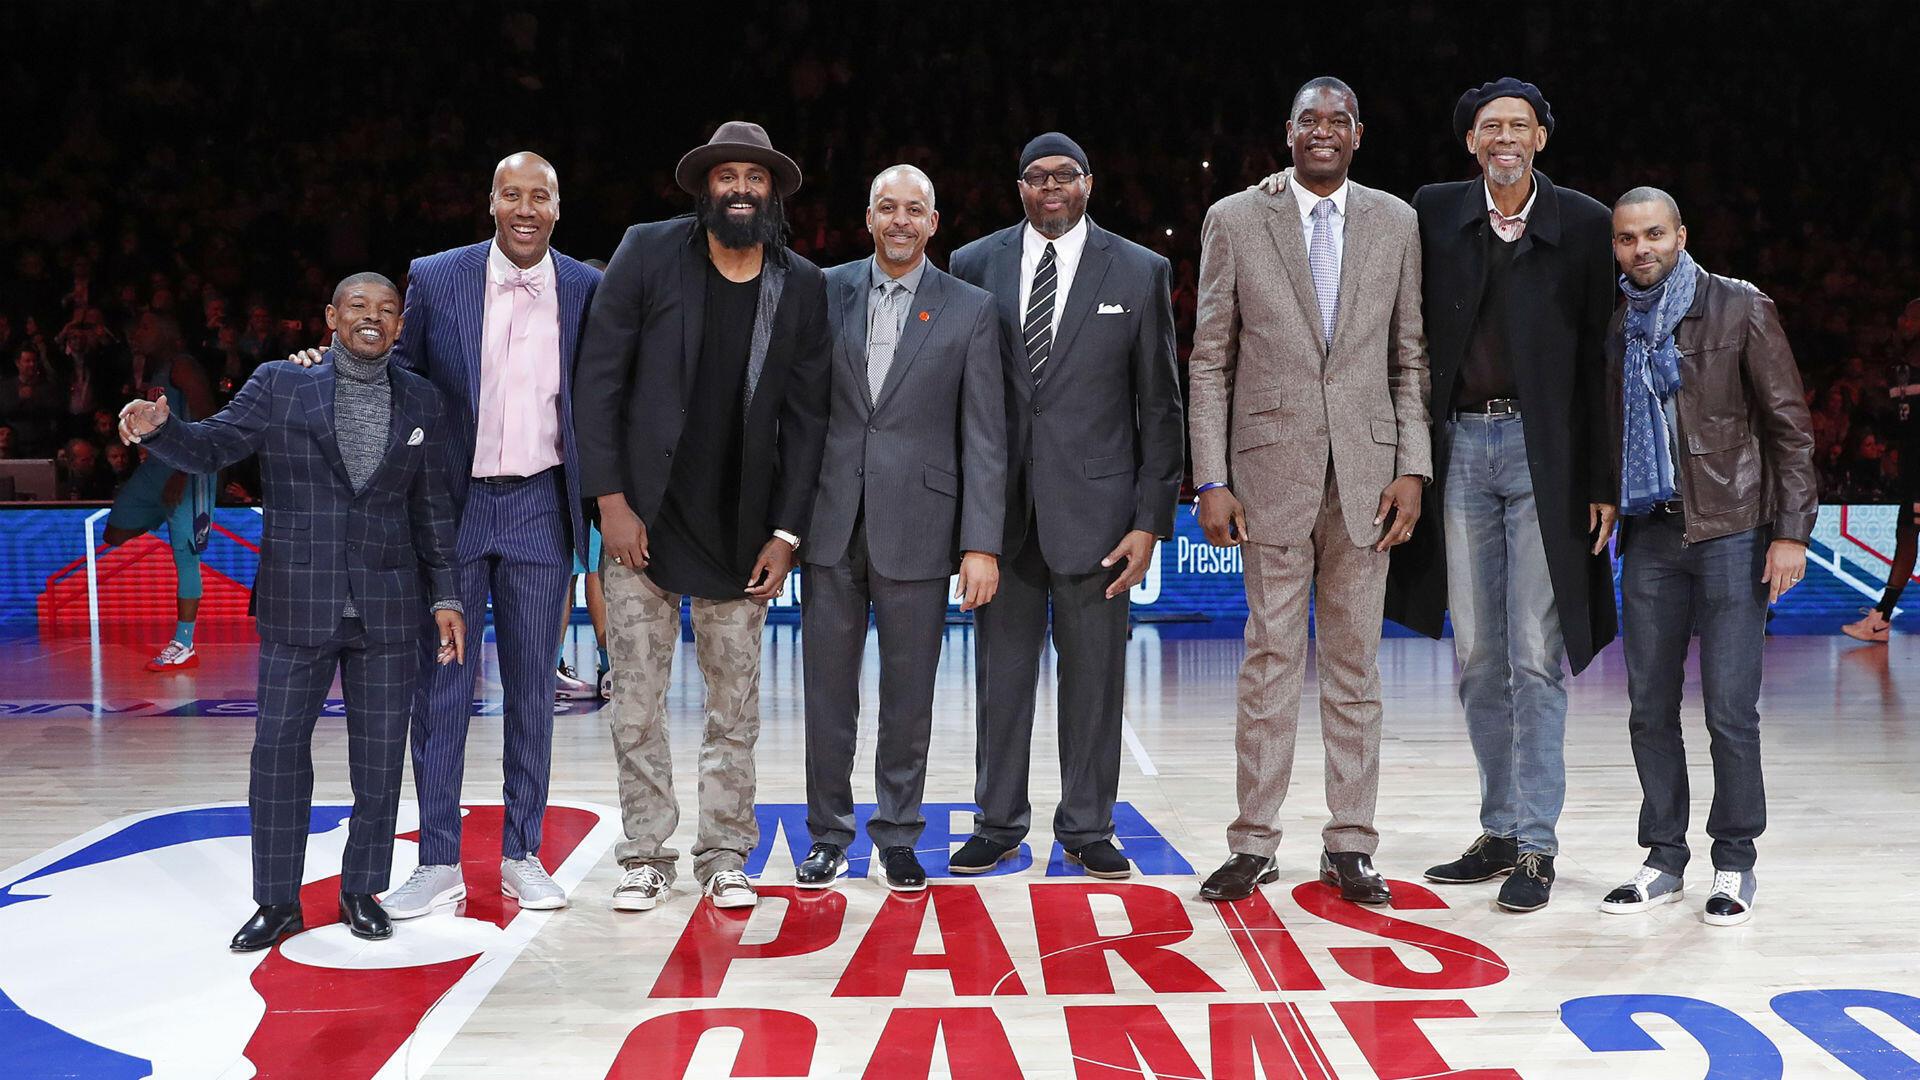 De gauche à droite : Muggsy Bogues, Bruce Bowen, Ronny Turiaf, Dell Curry, Sam Perkins, Dikembe Mutombo, Kareem Abdul-Jabbar et Tony Parker.